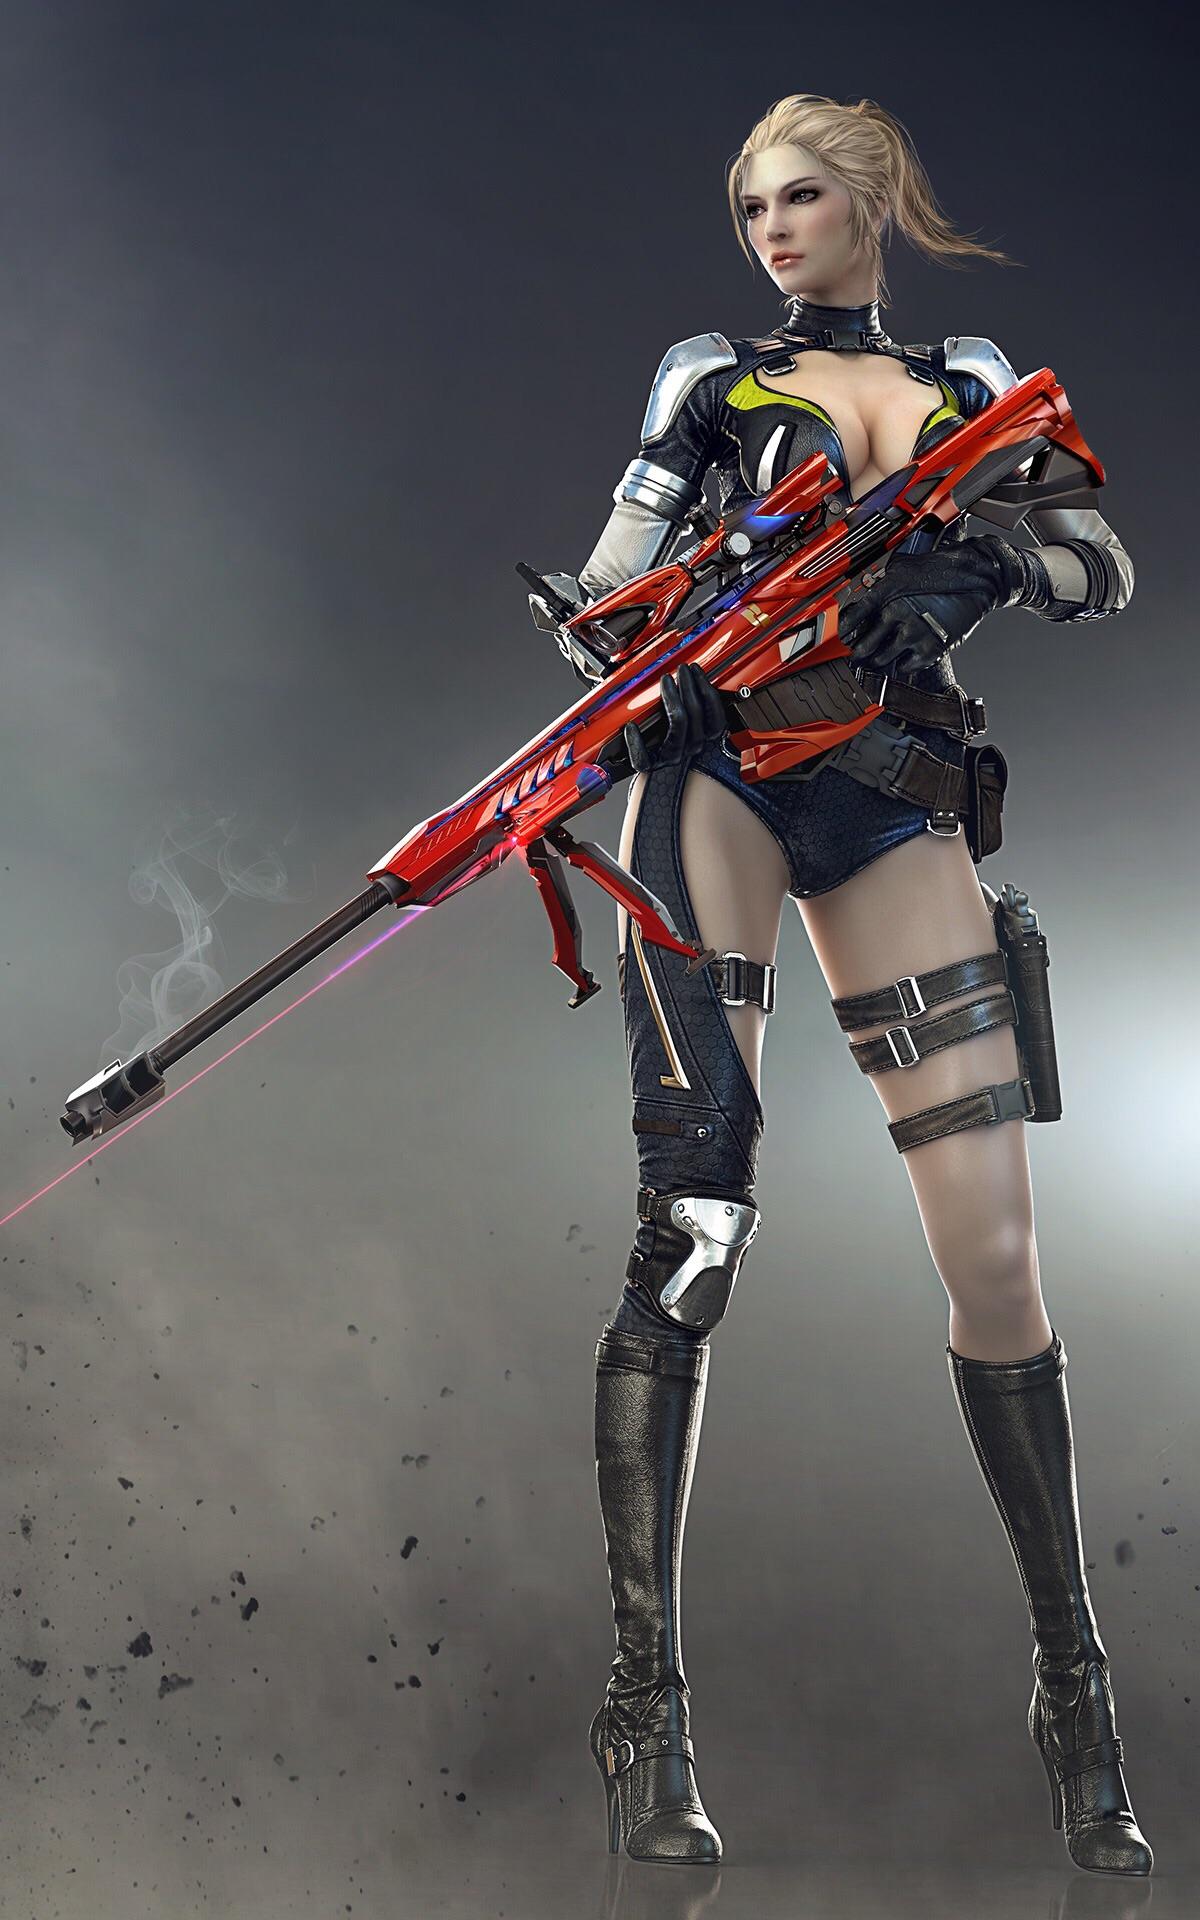 Barrett M82A1-Iron Shark | Crossfire Wiki | FANDOM powered